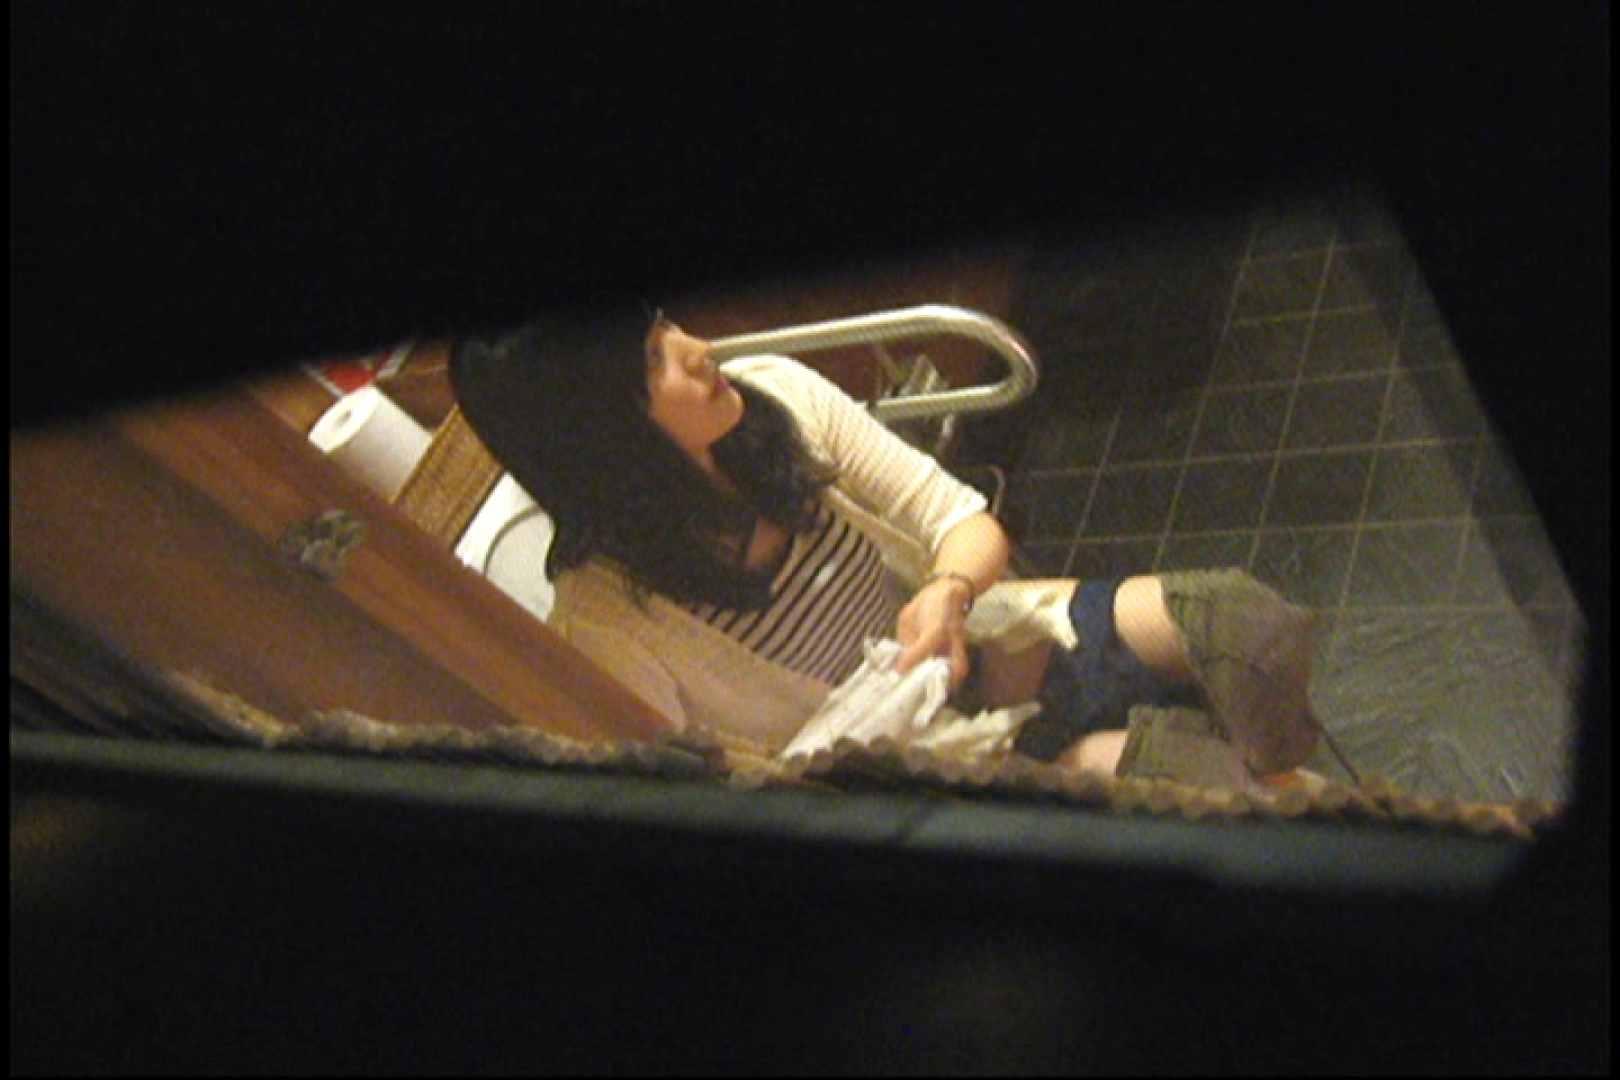 No.4 美人の洋式kawaya内での様子を観察! 盗撮・必見  86画像 30